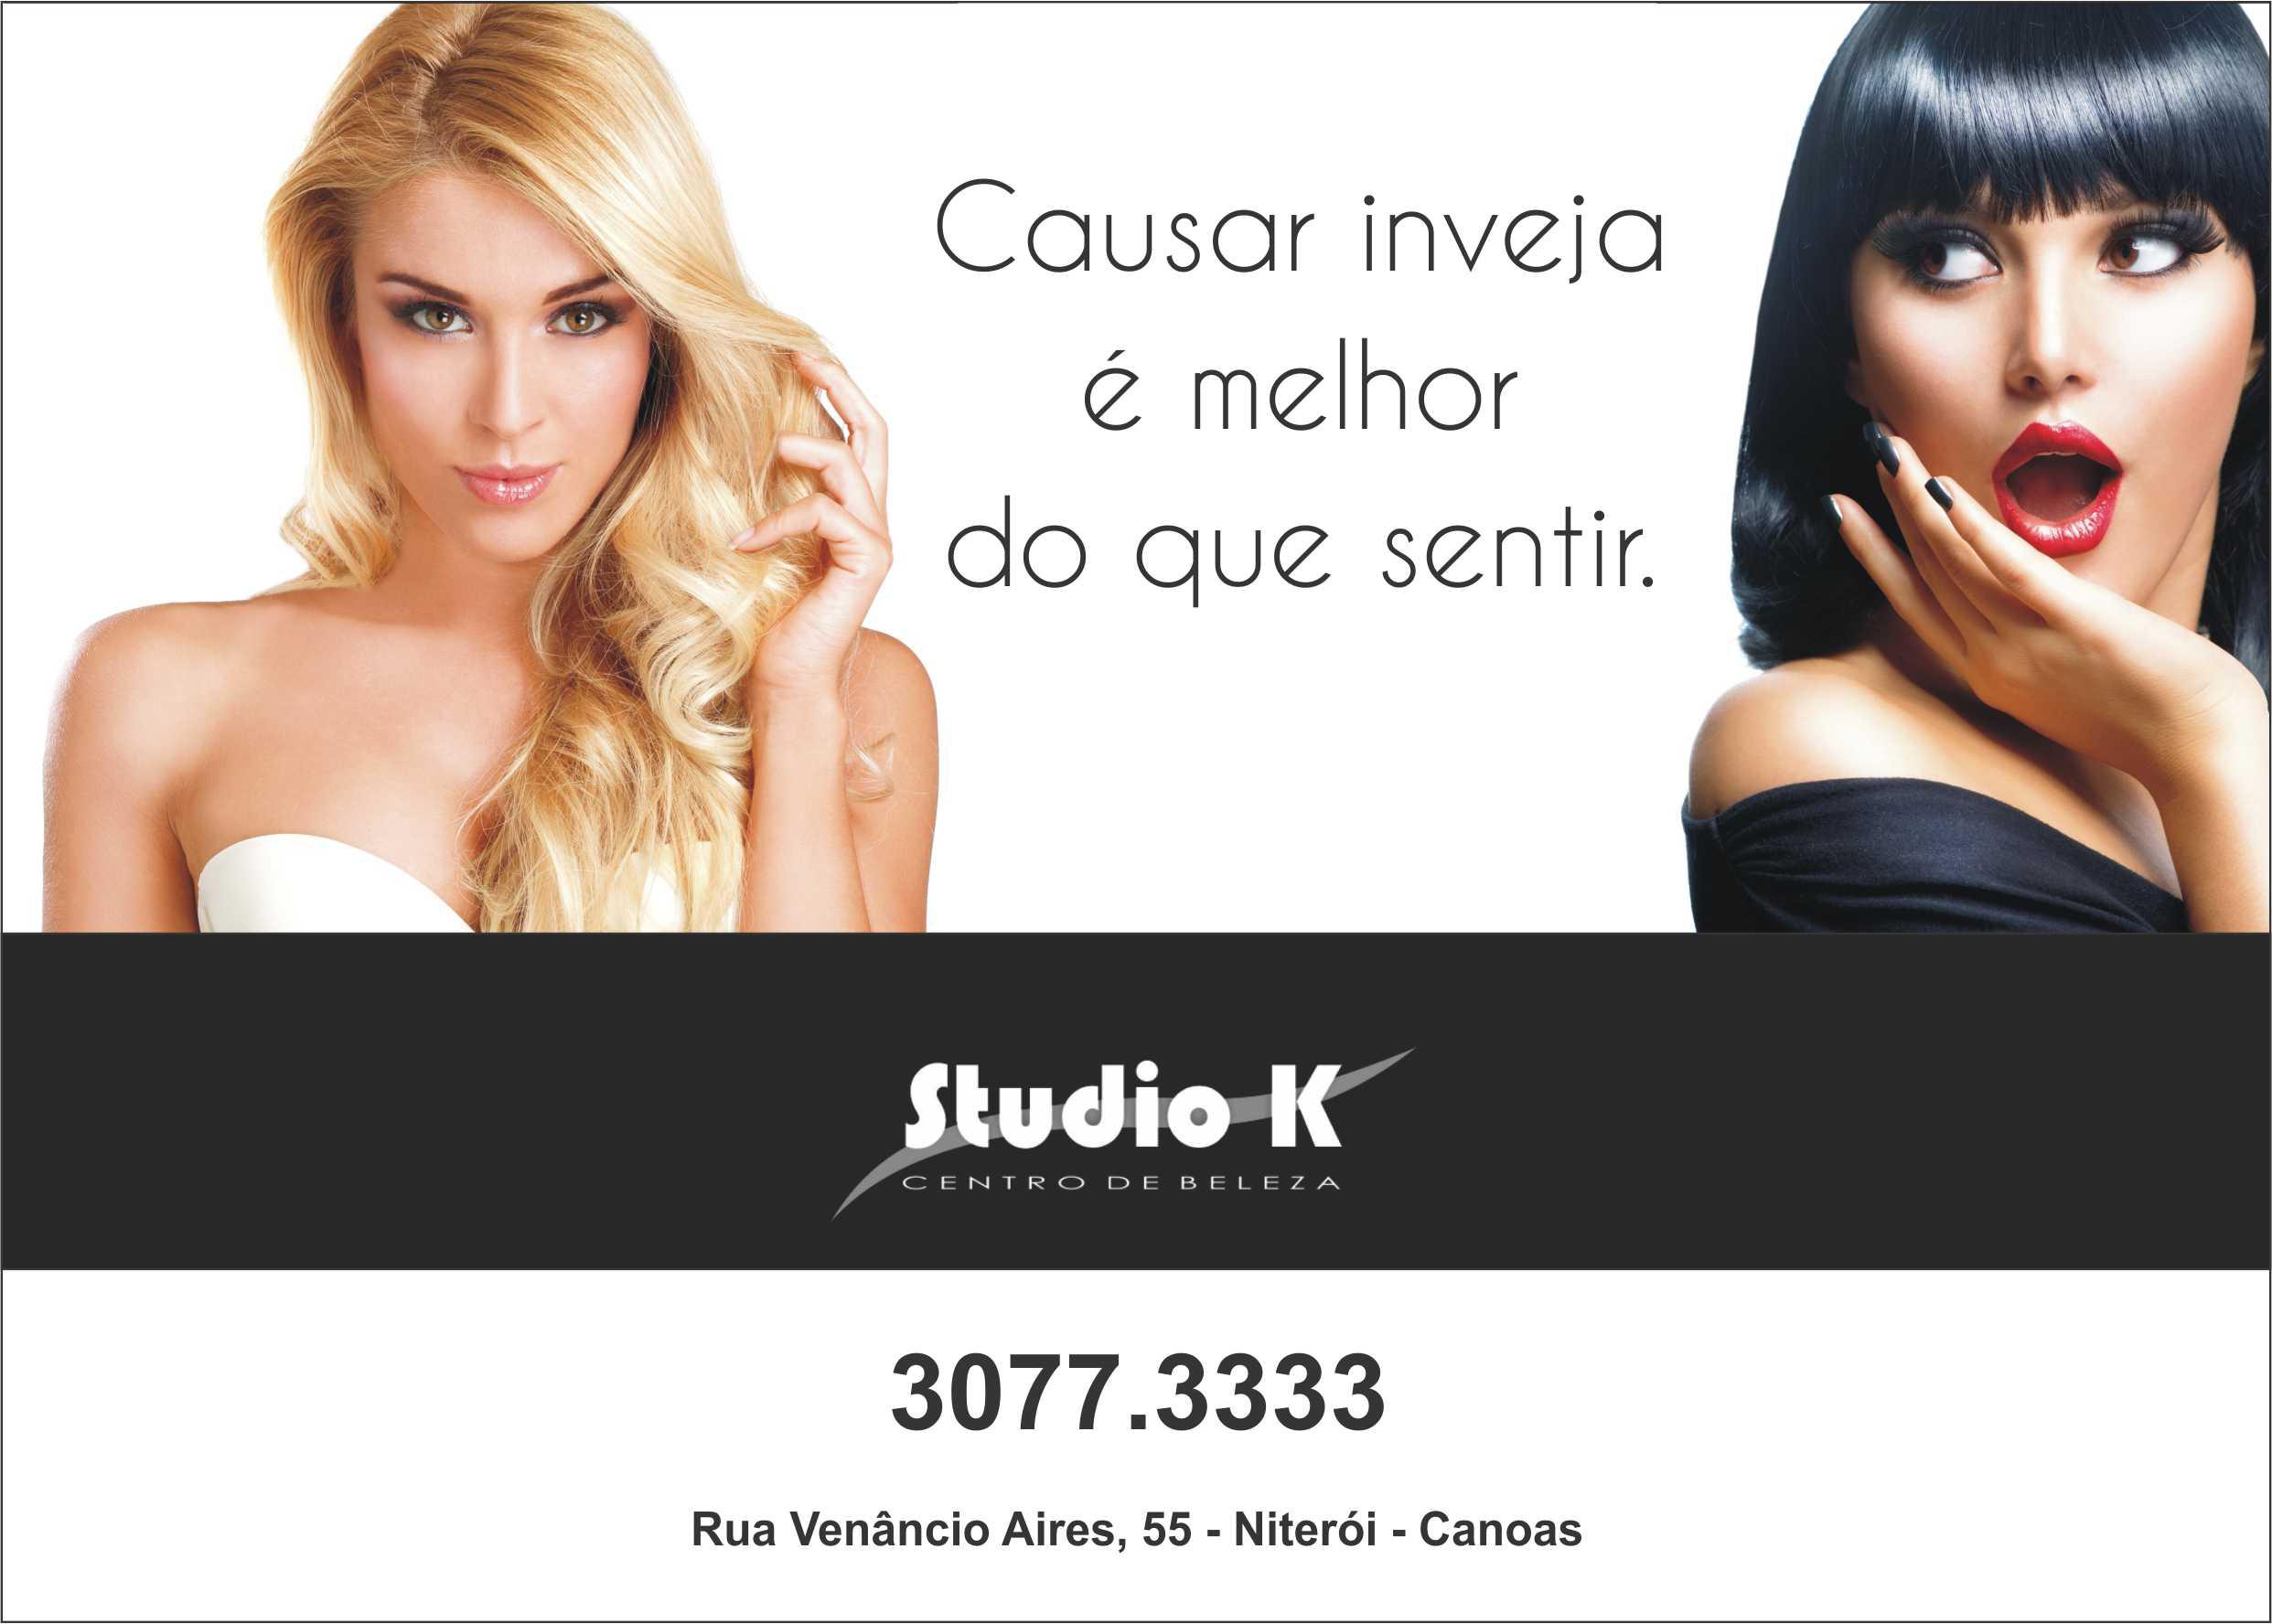 Studio k